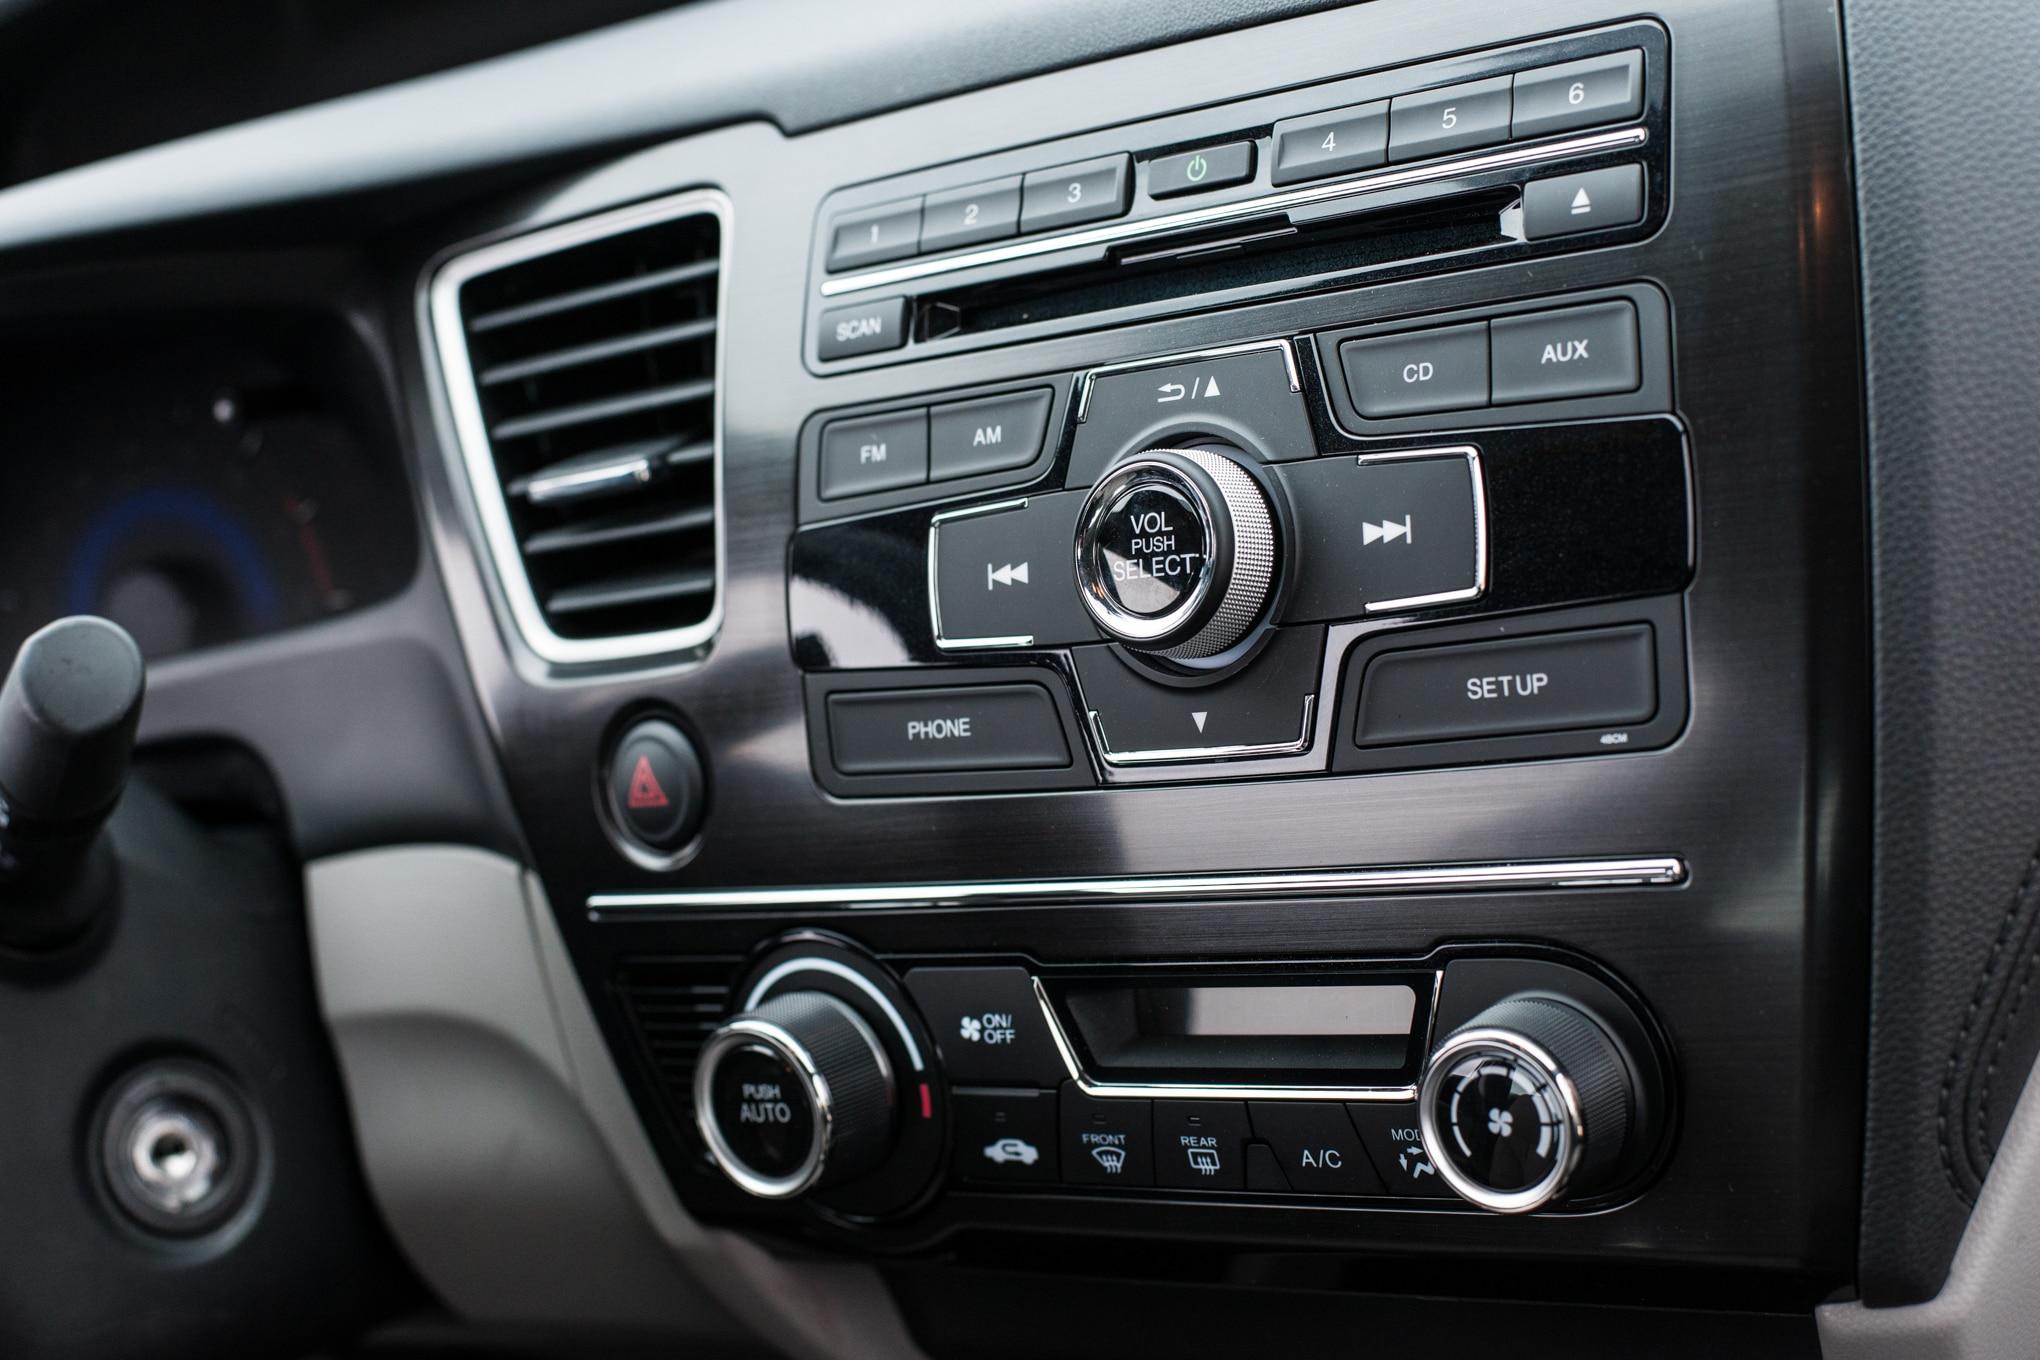 2014 compact sedan comparison review day 4 automobile. Black Bedroom Furniture Sets. Home Design Ideas